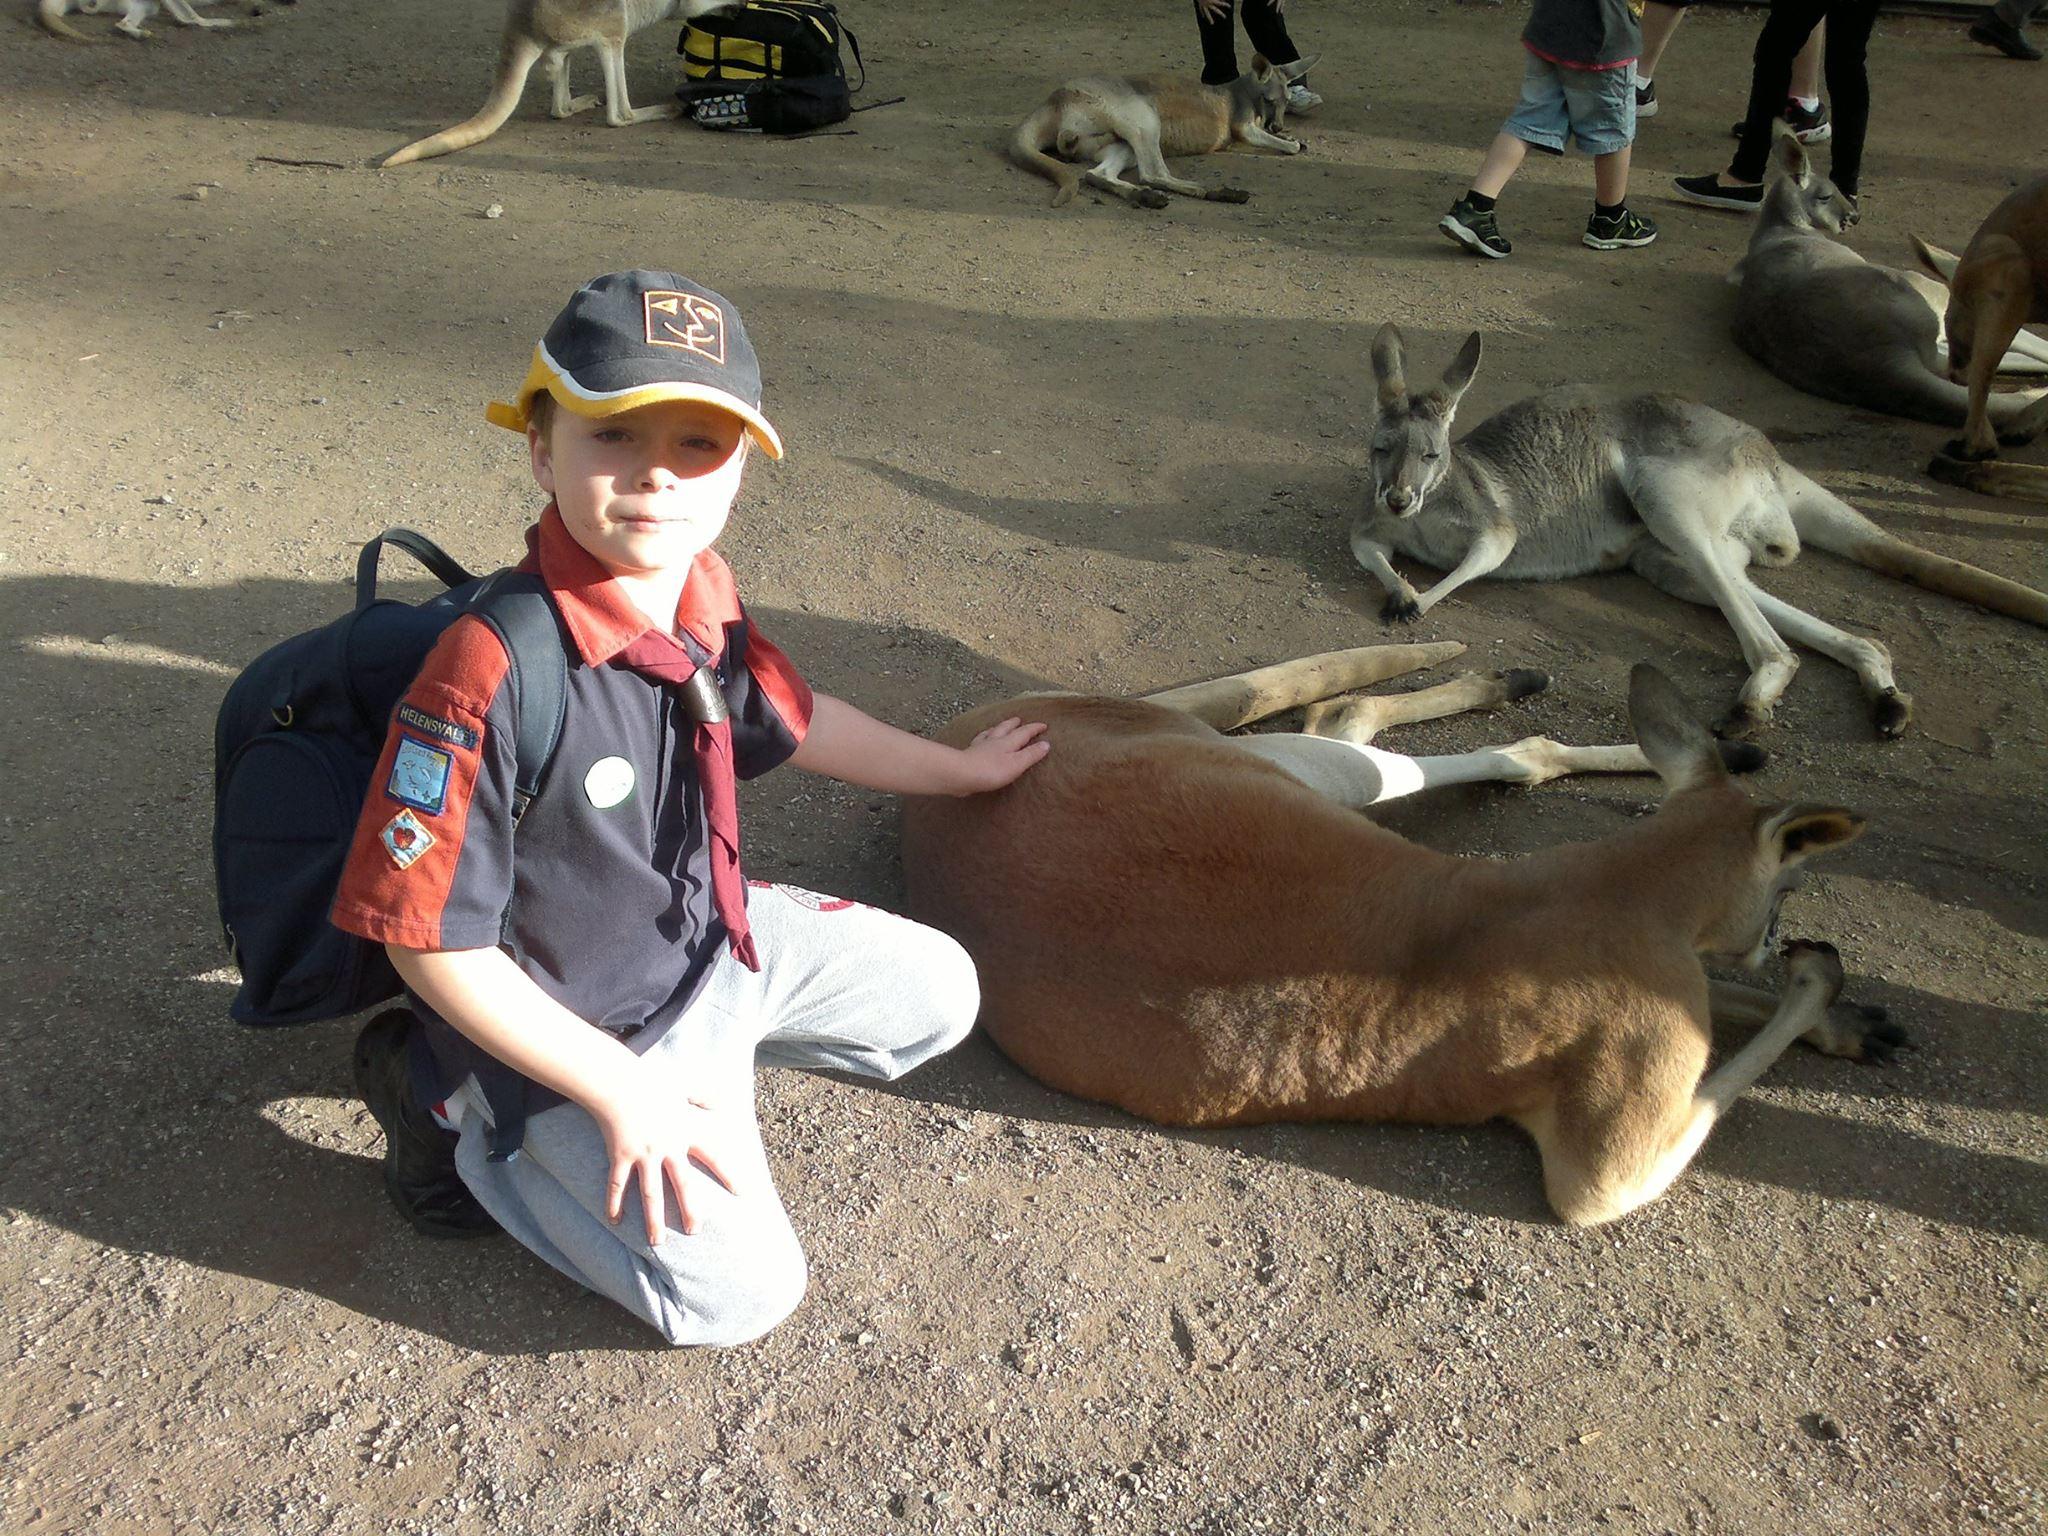 Joey_Kylie mcqueen 2014 kangaroo